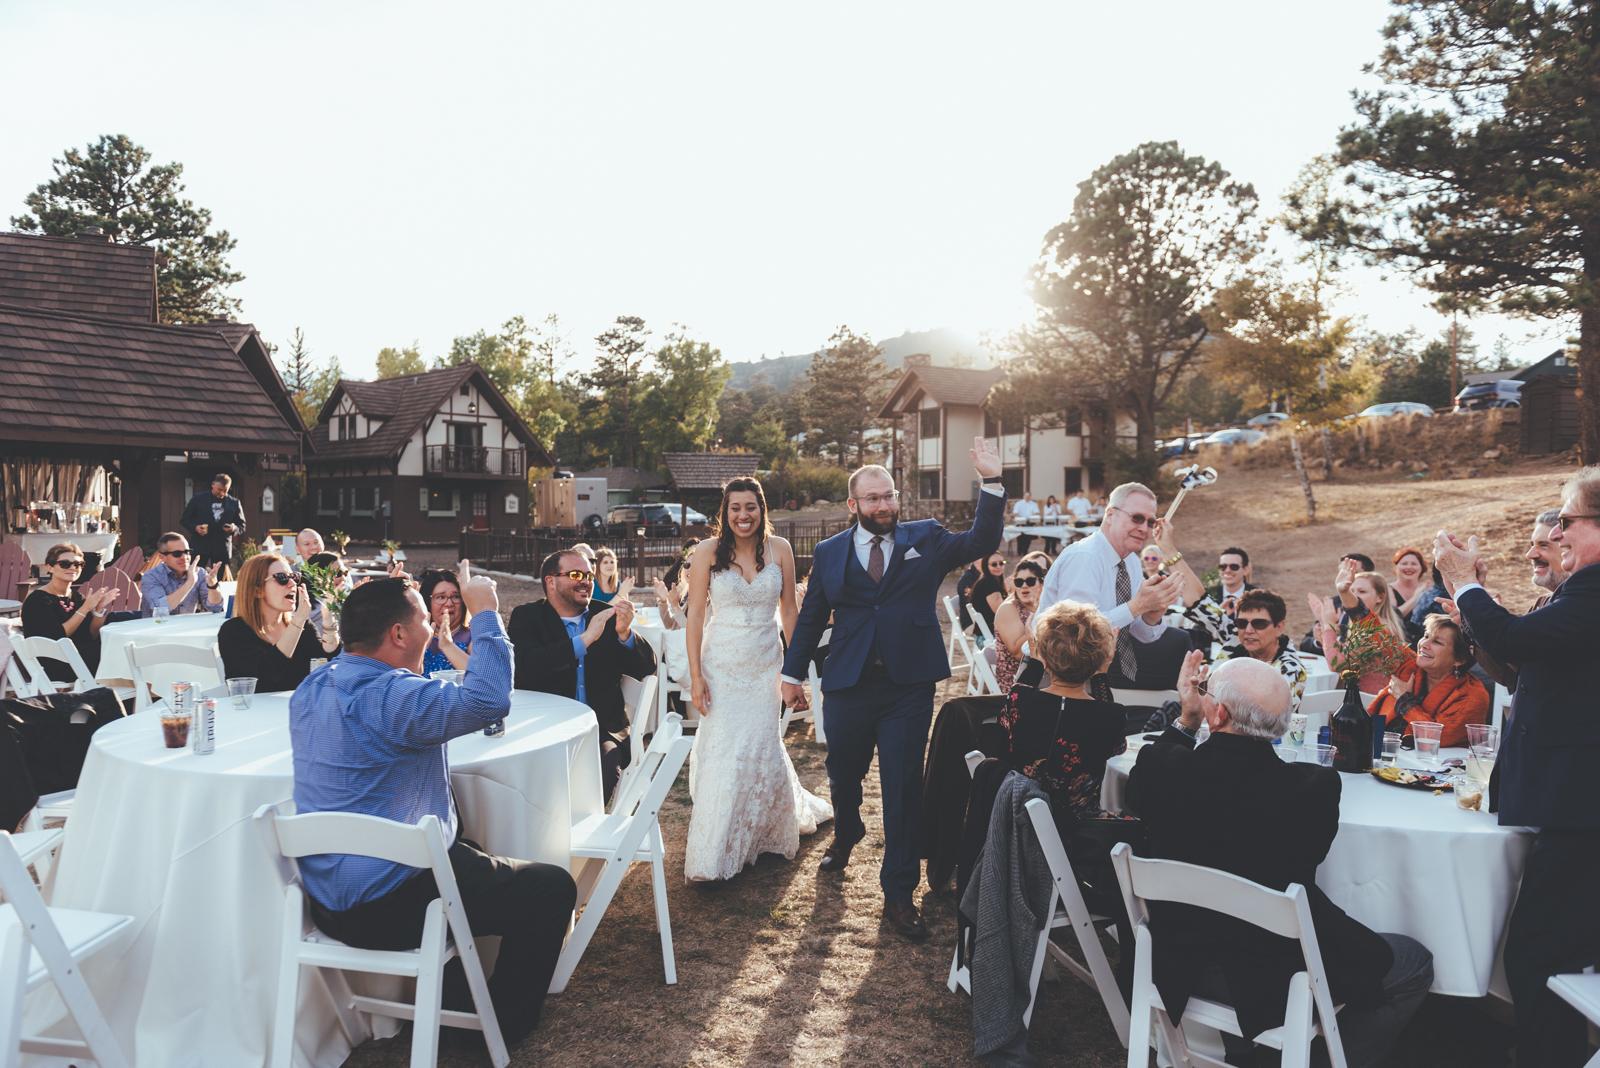 ChadFahnestockPhotography-estes-park-wedding-photography-046.jpg